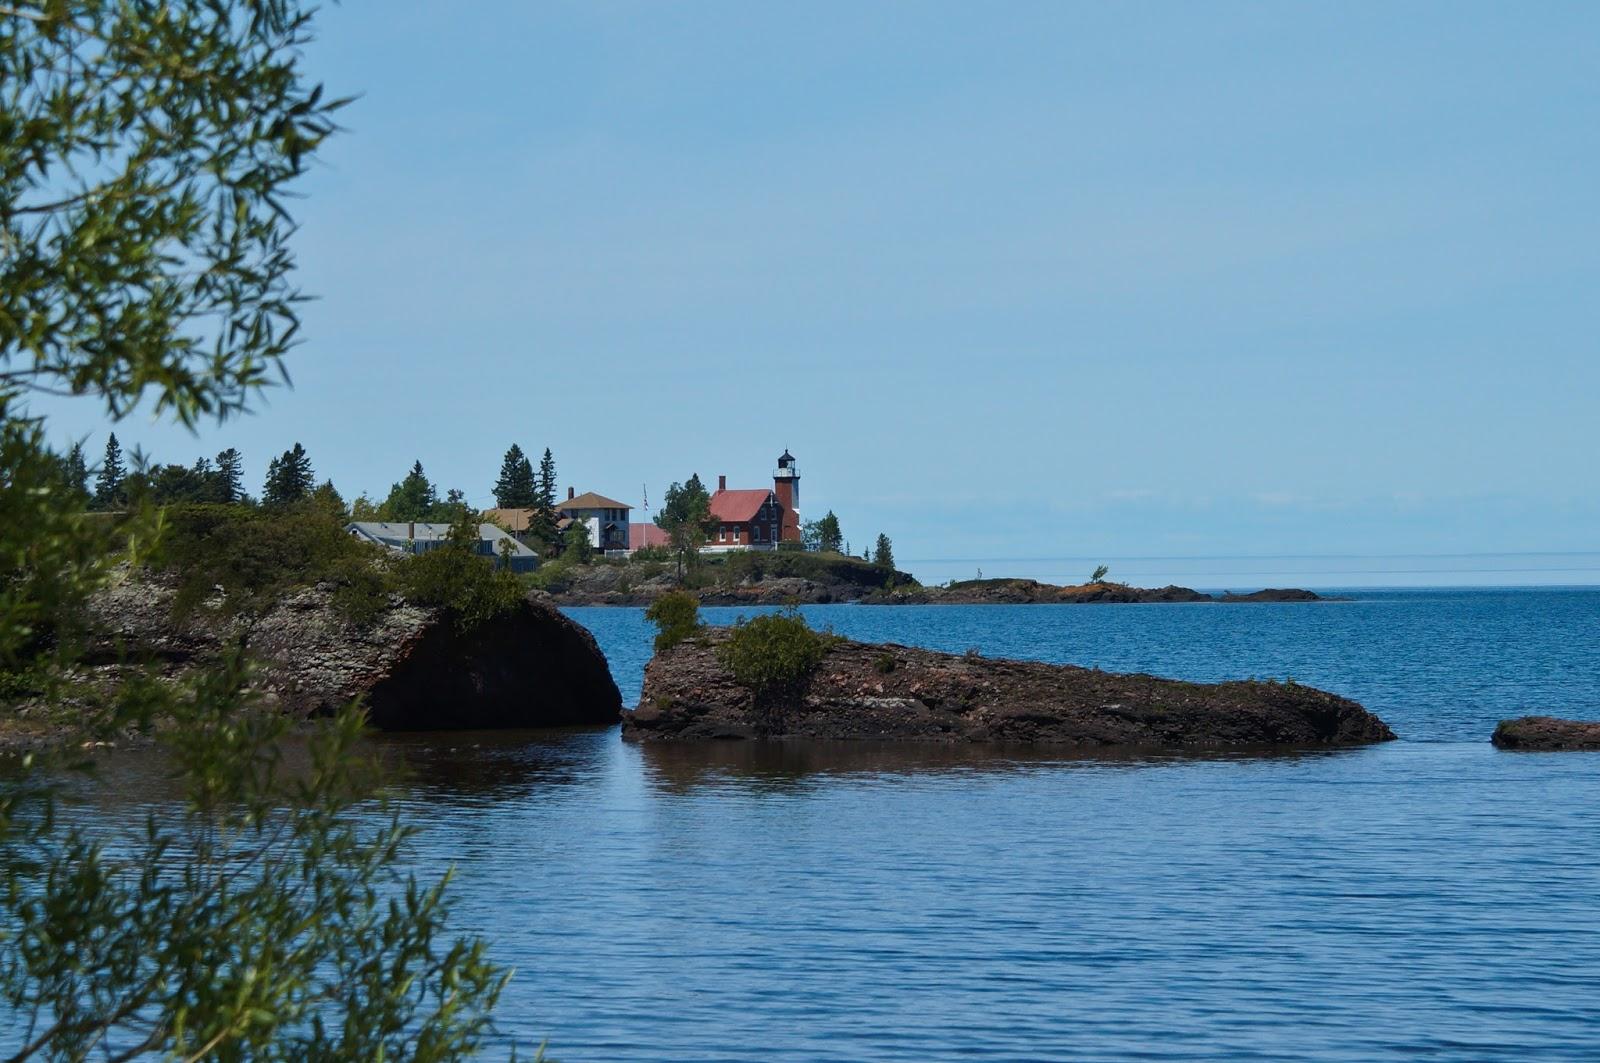 Eagle Harbor Lighthouse, Keweenaw Peninsula, Michigan  № 2240114  скачать